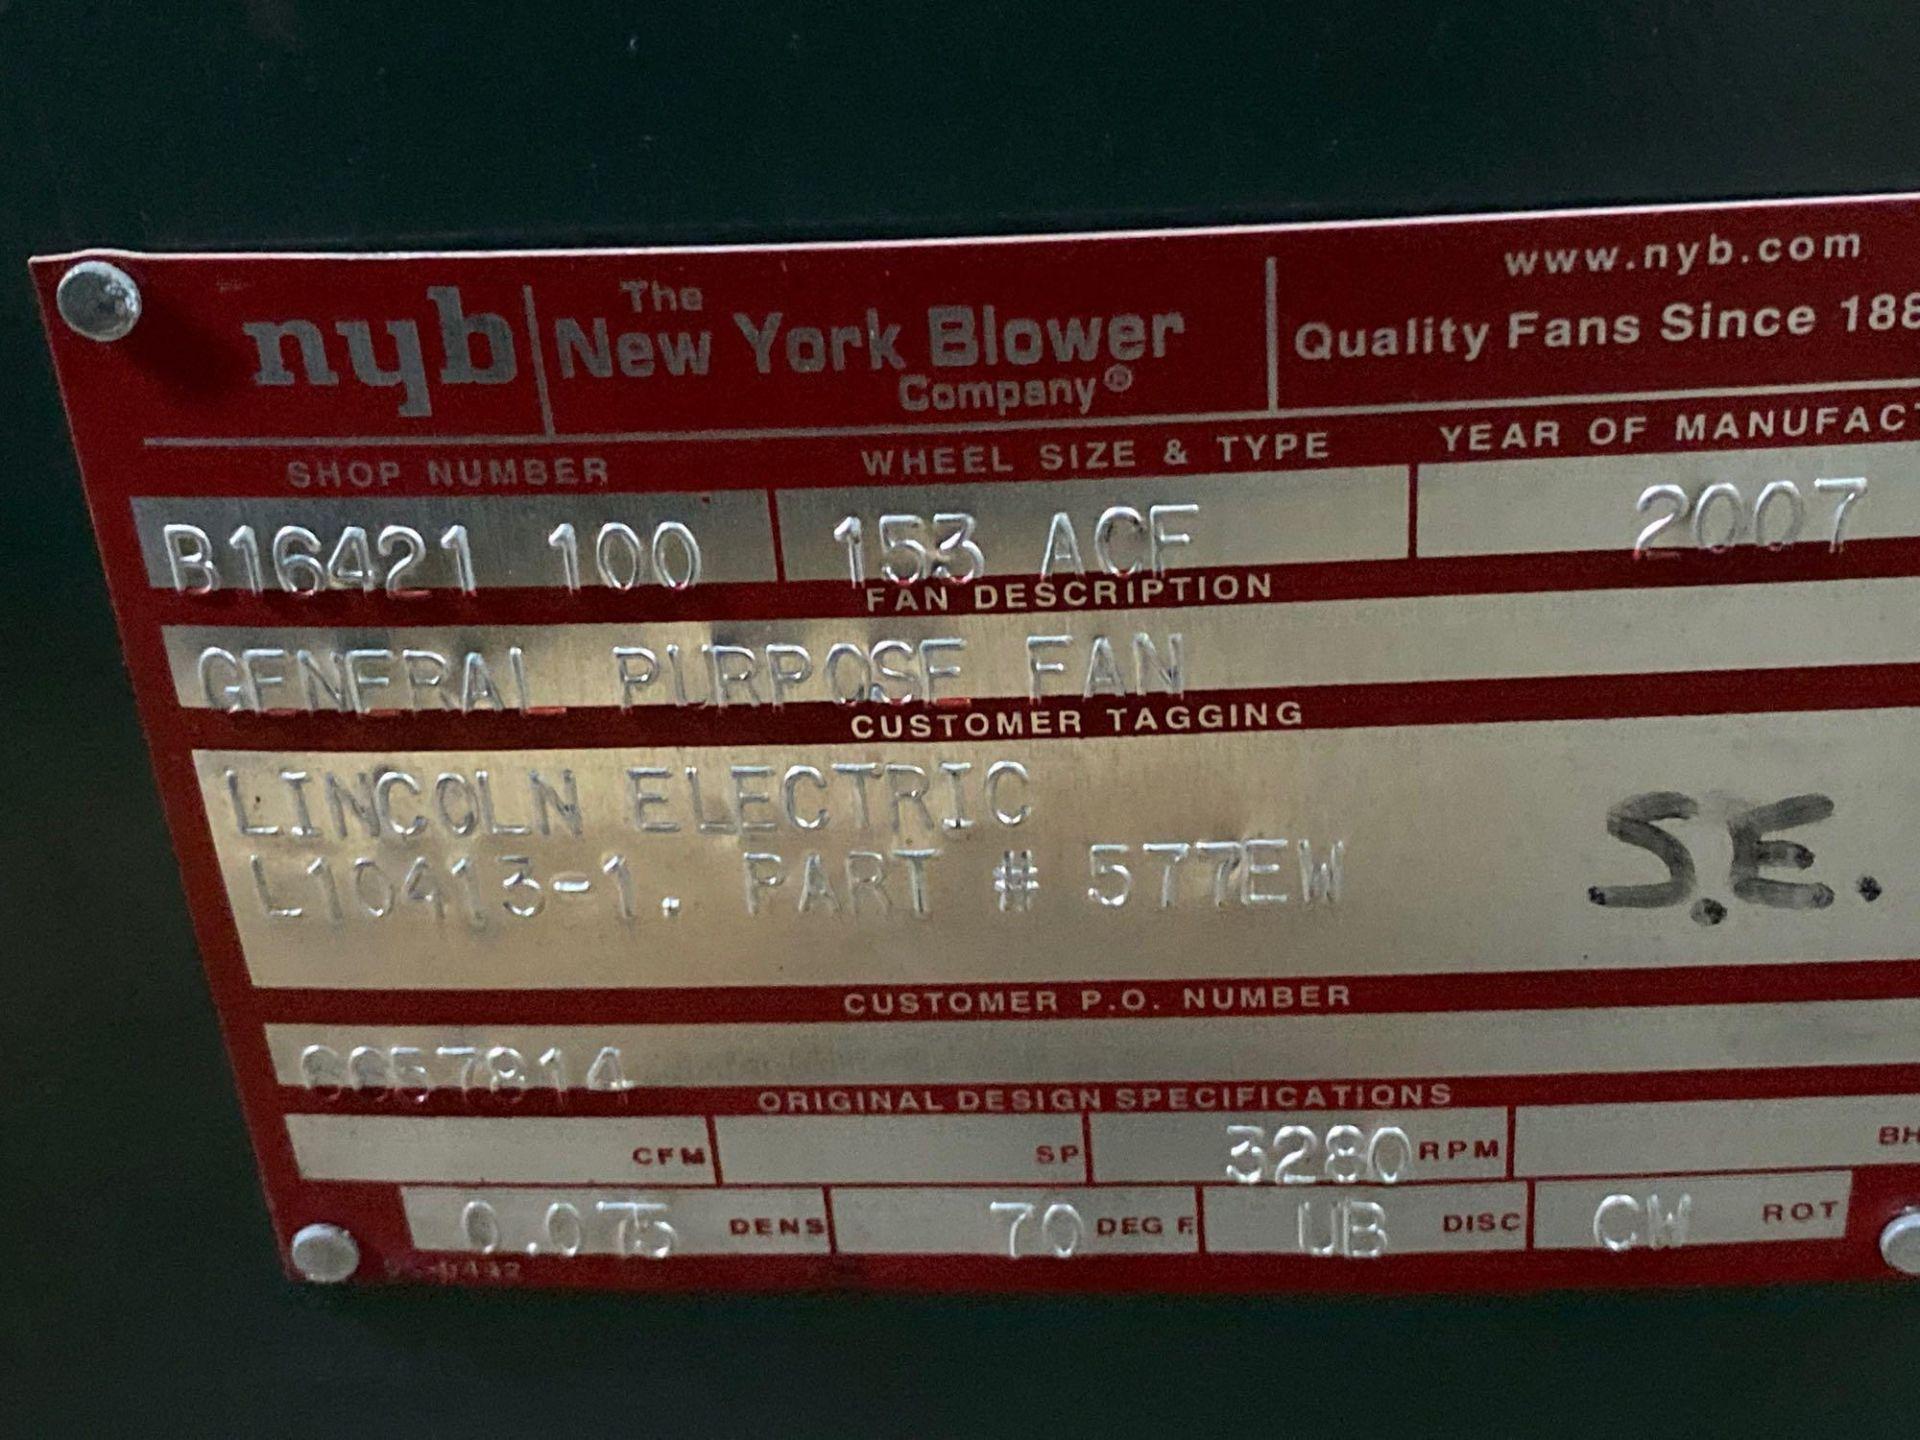 New York Blower Company - Image 5 of 8